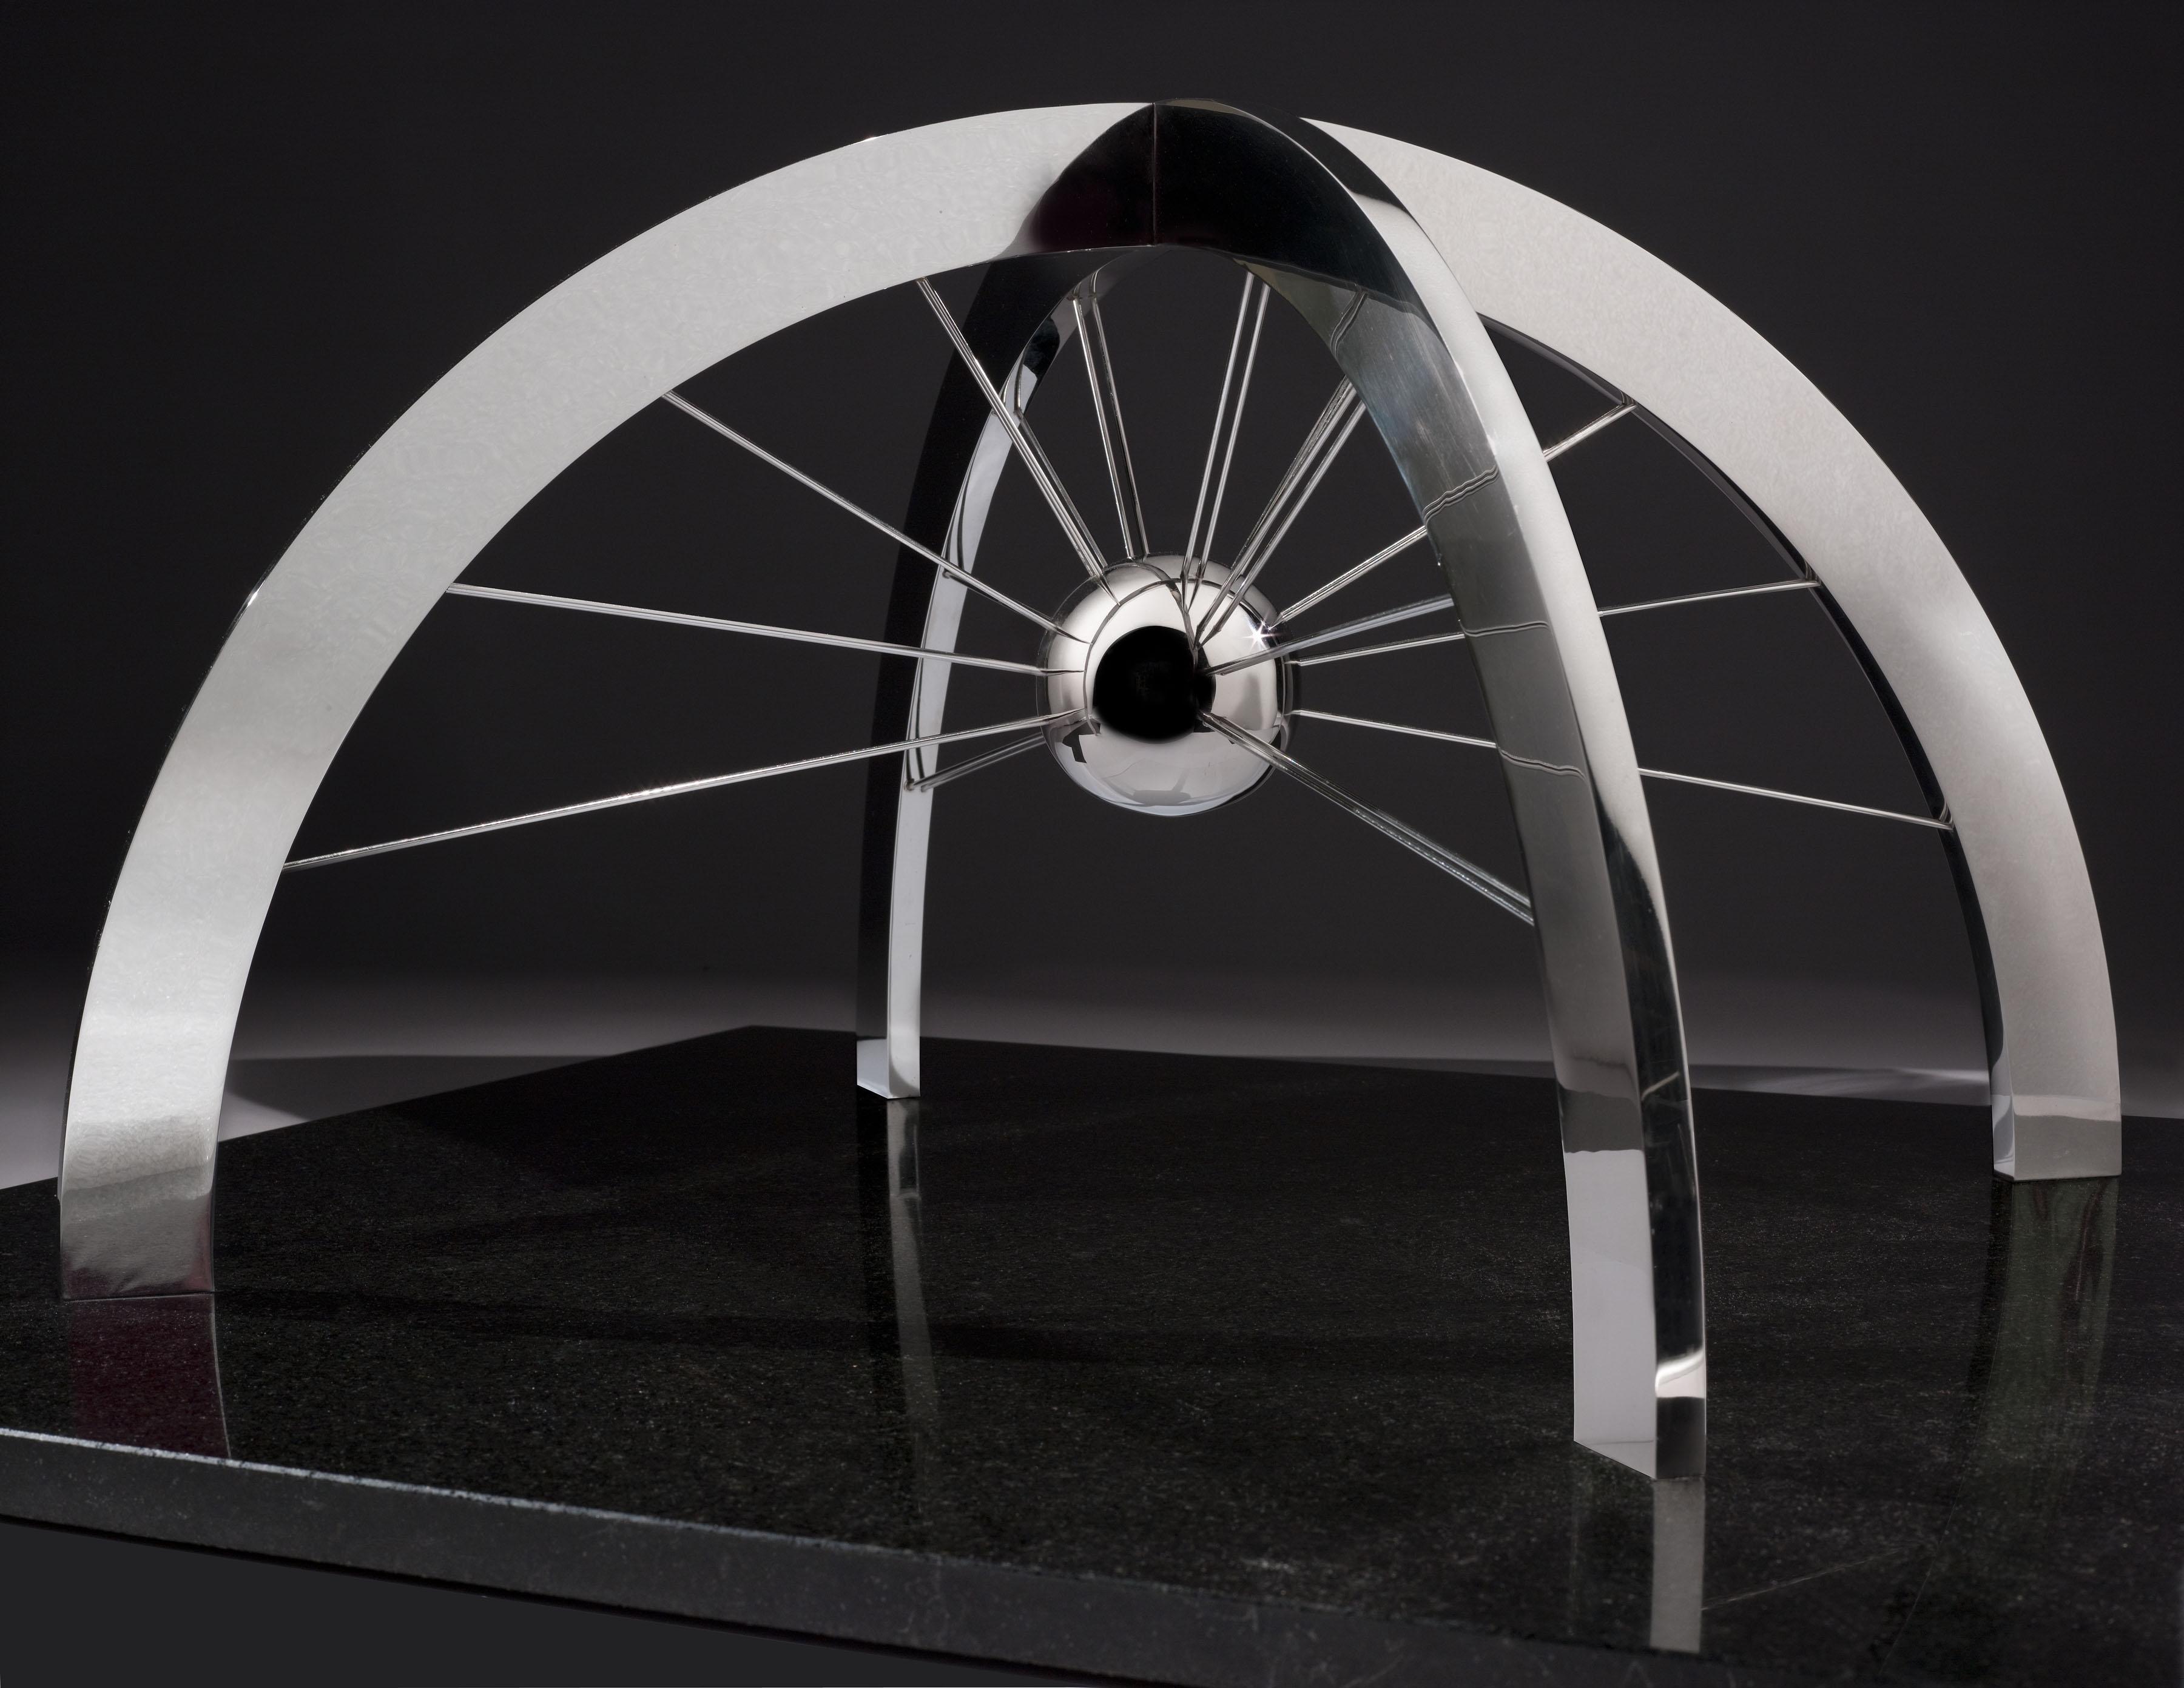 Futuristic sculpture